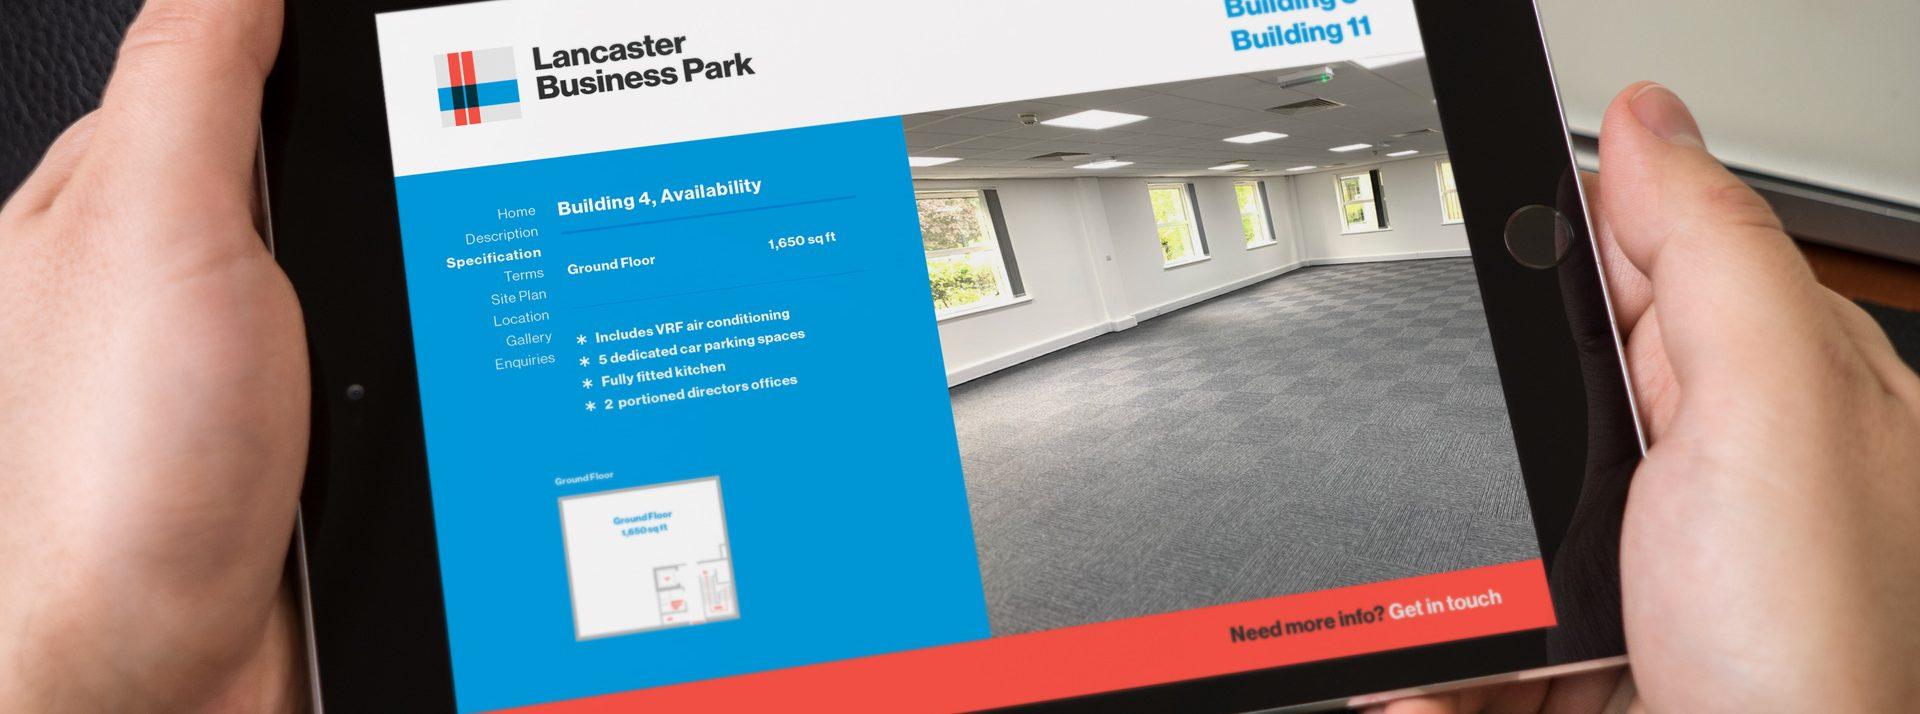 eBrochure created for Lancaster Business Park